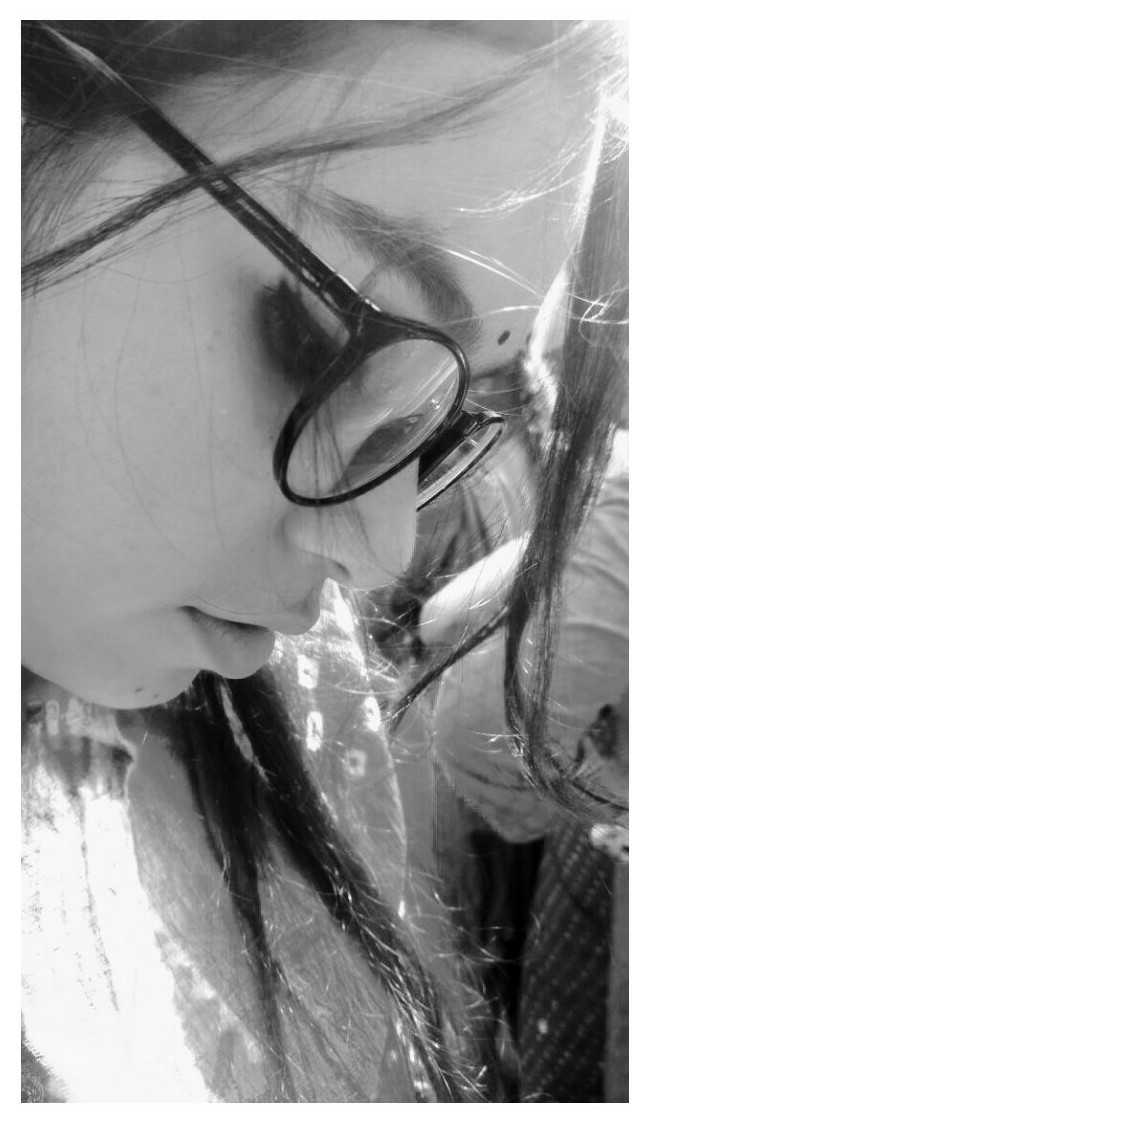 Safia Habib Literature student, art enthusiast